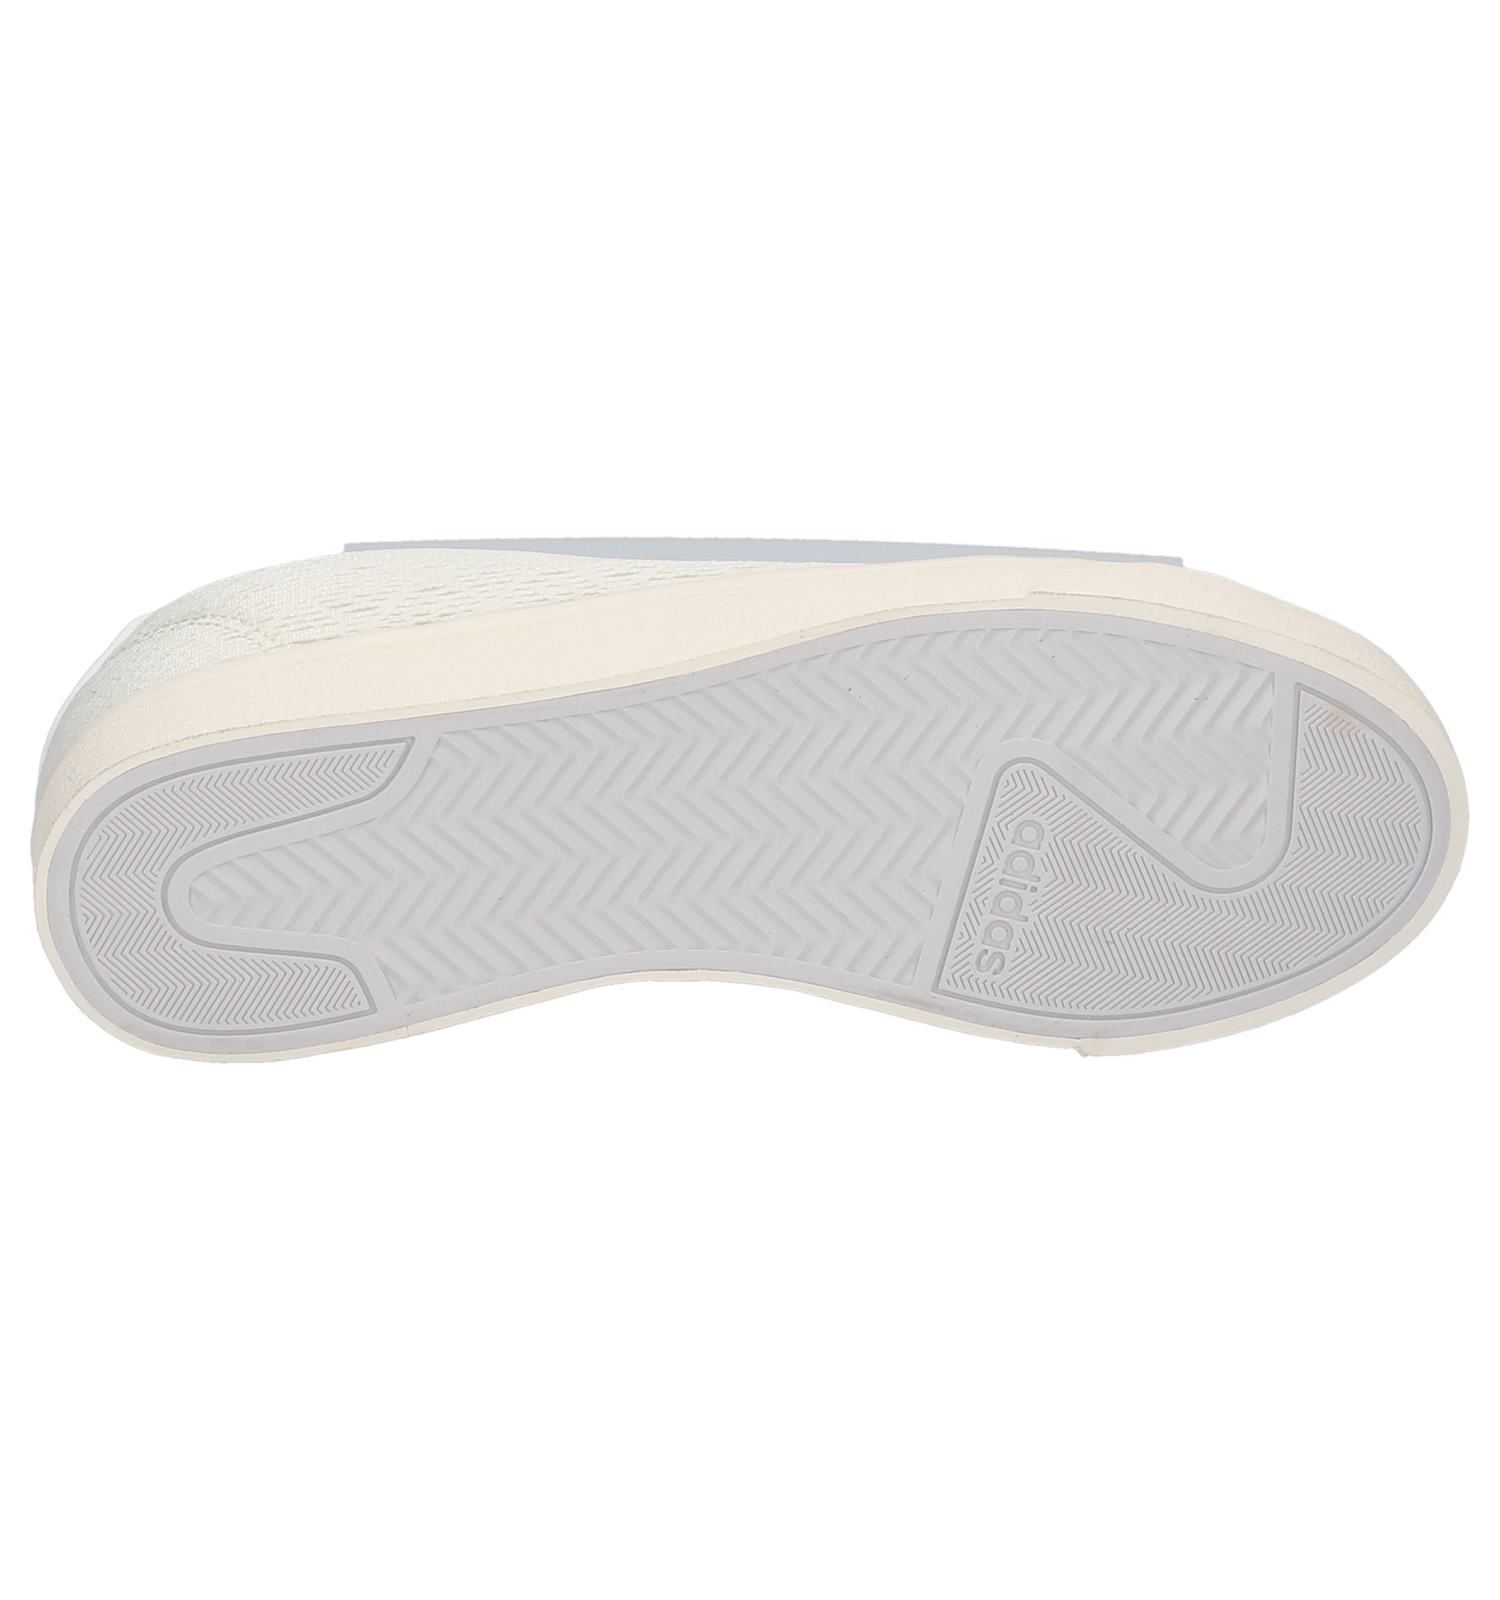 Ecru Sneakers Cloudfoam Cl Qt Adidas Daily OXwPkn80